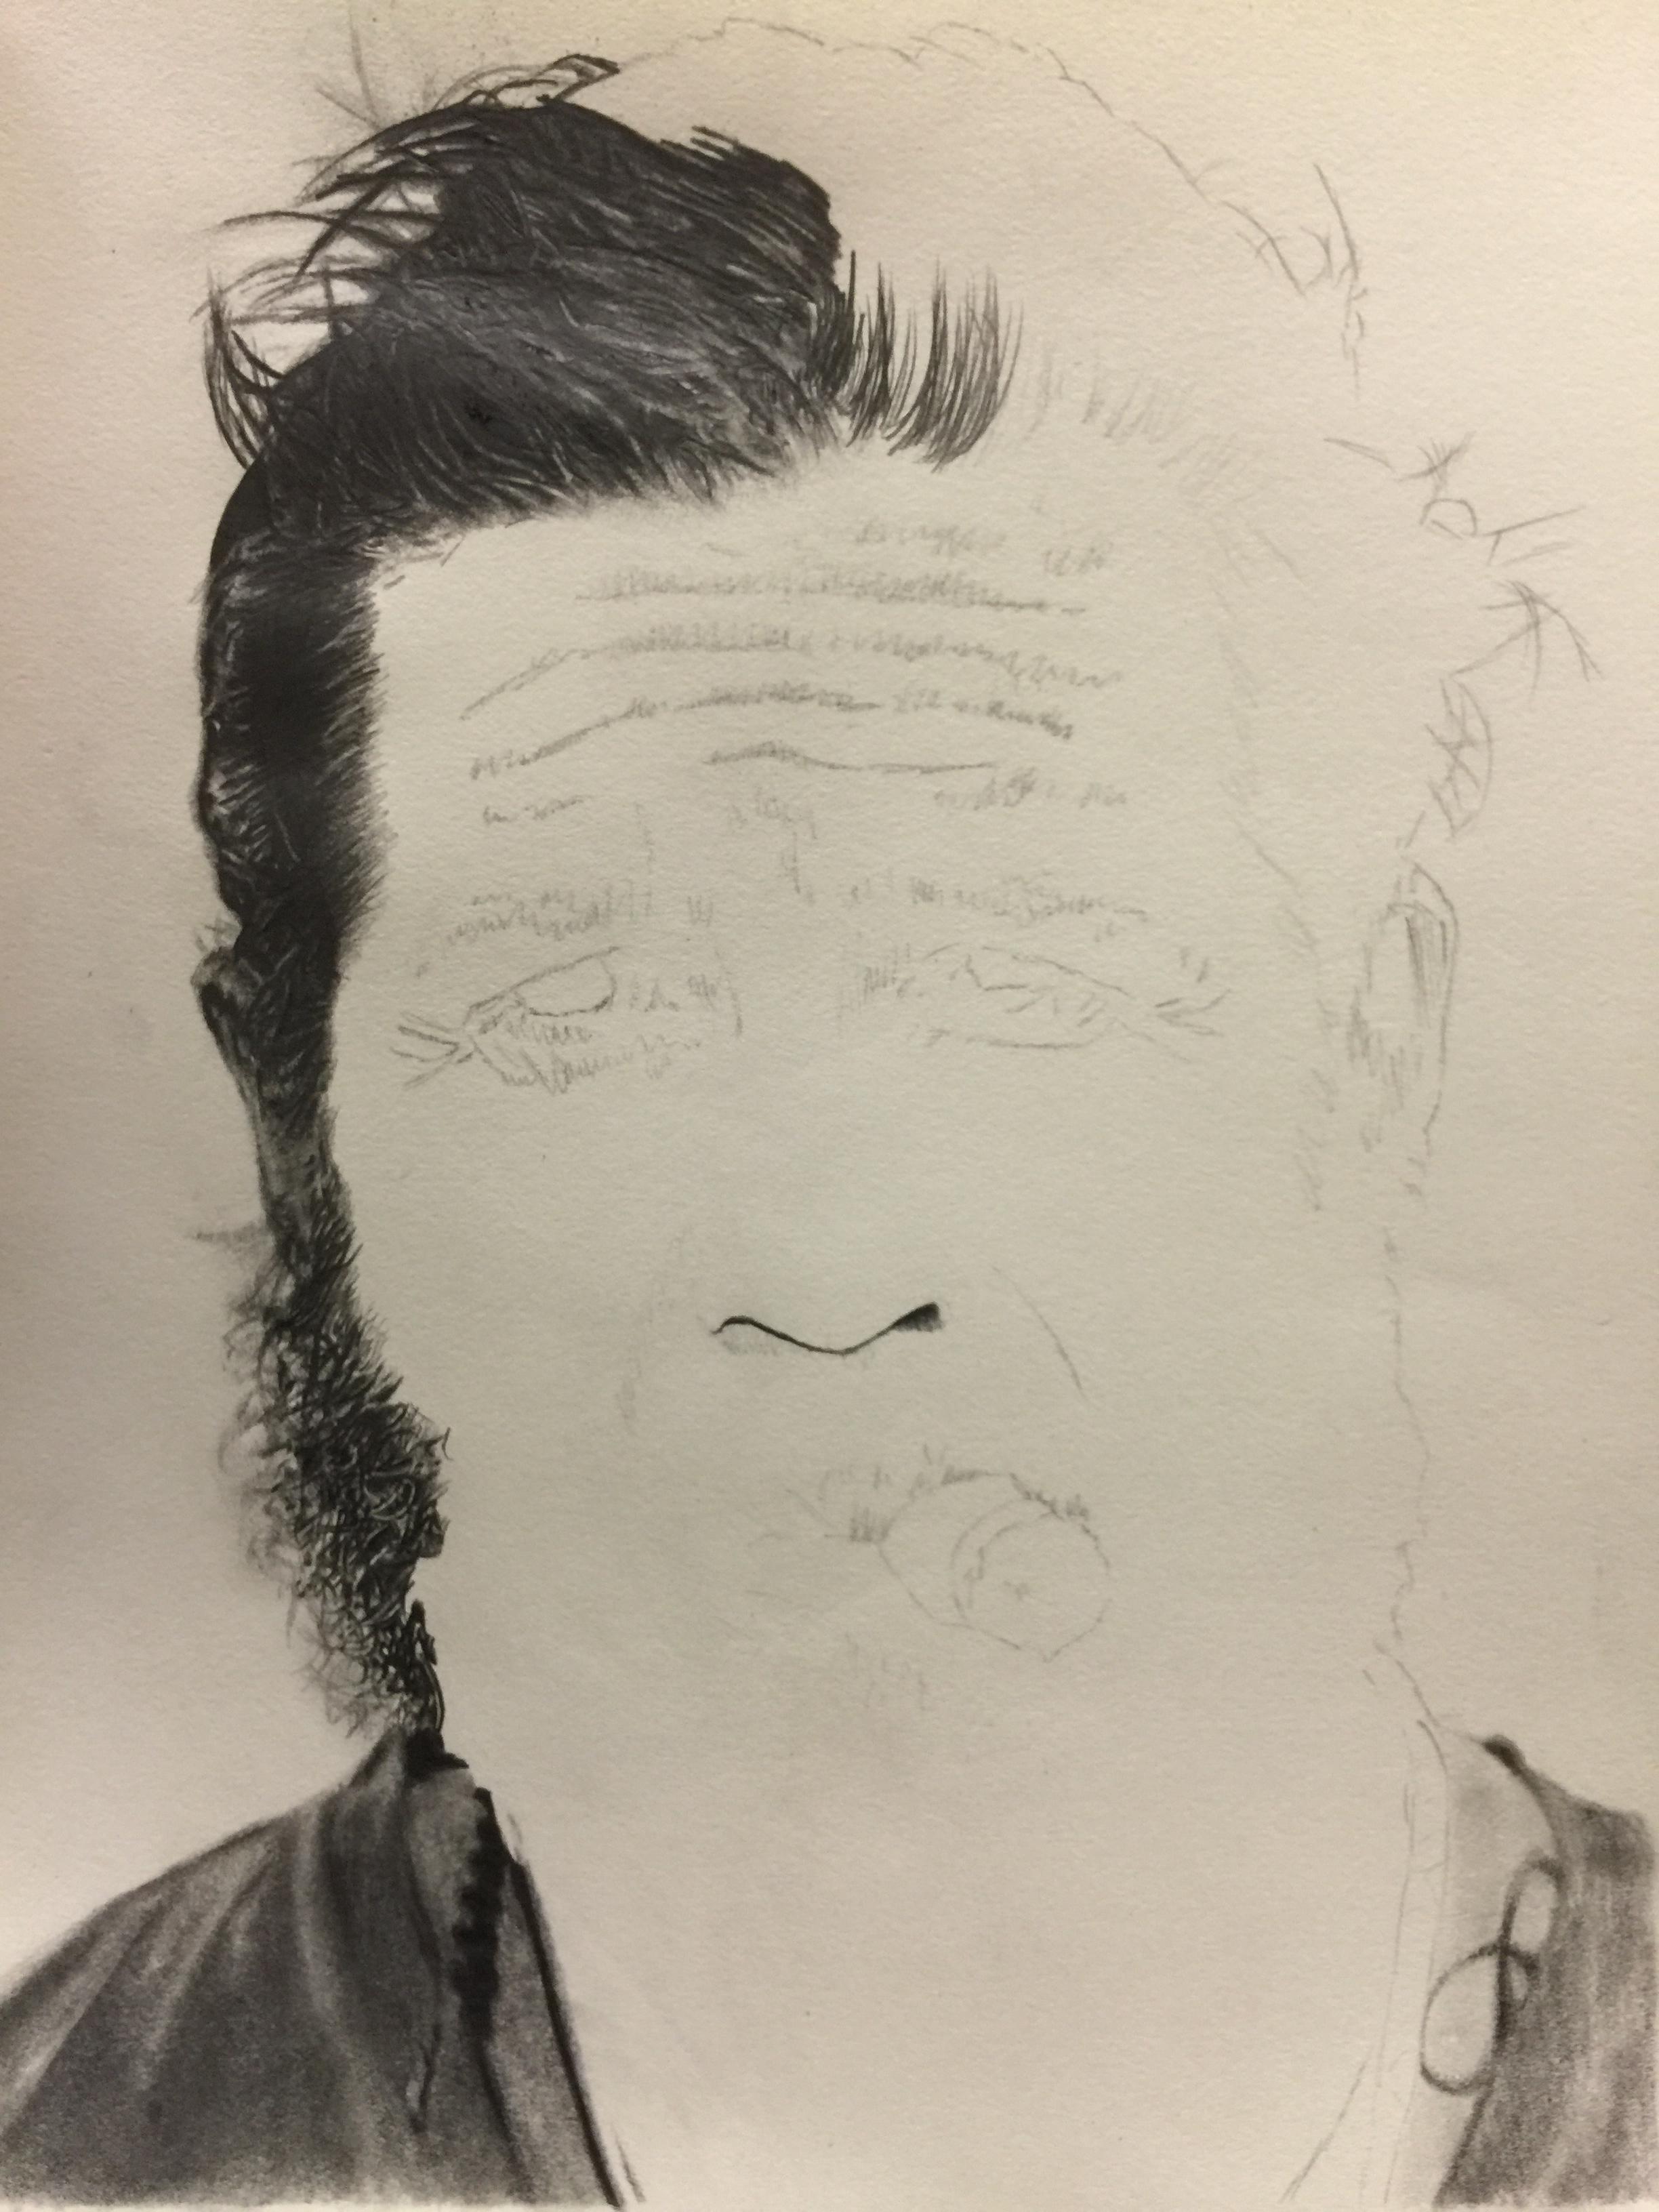 gom_hardy_cigar_drawing_progression_a_rajzolas_folyamata_szivarozas_1.jpg